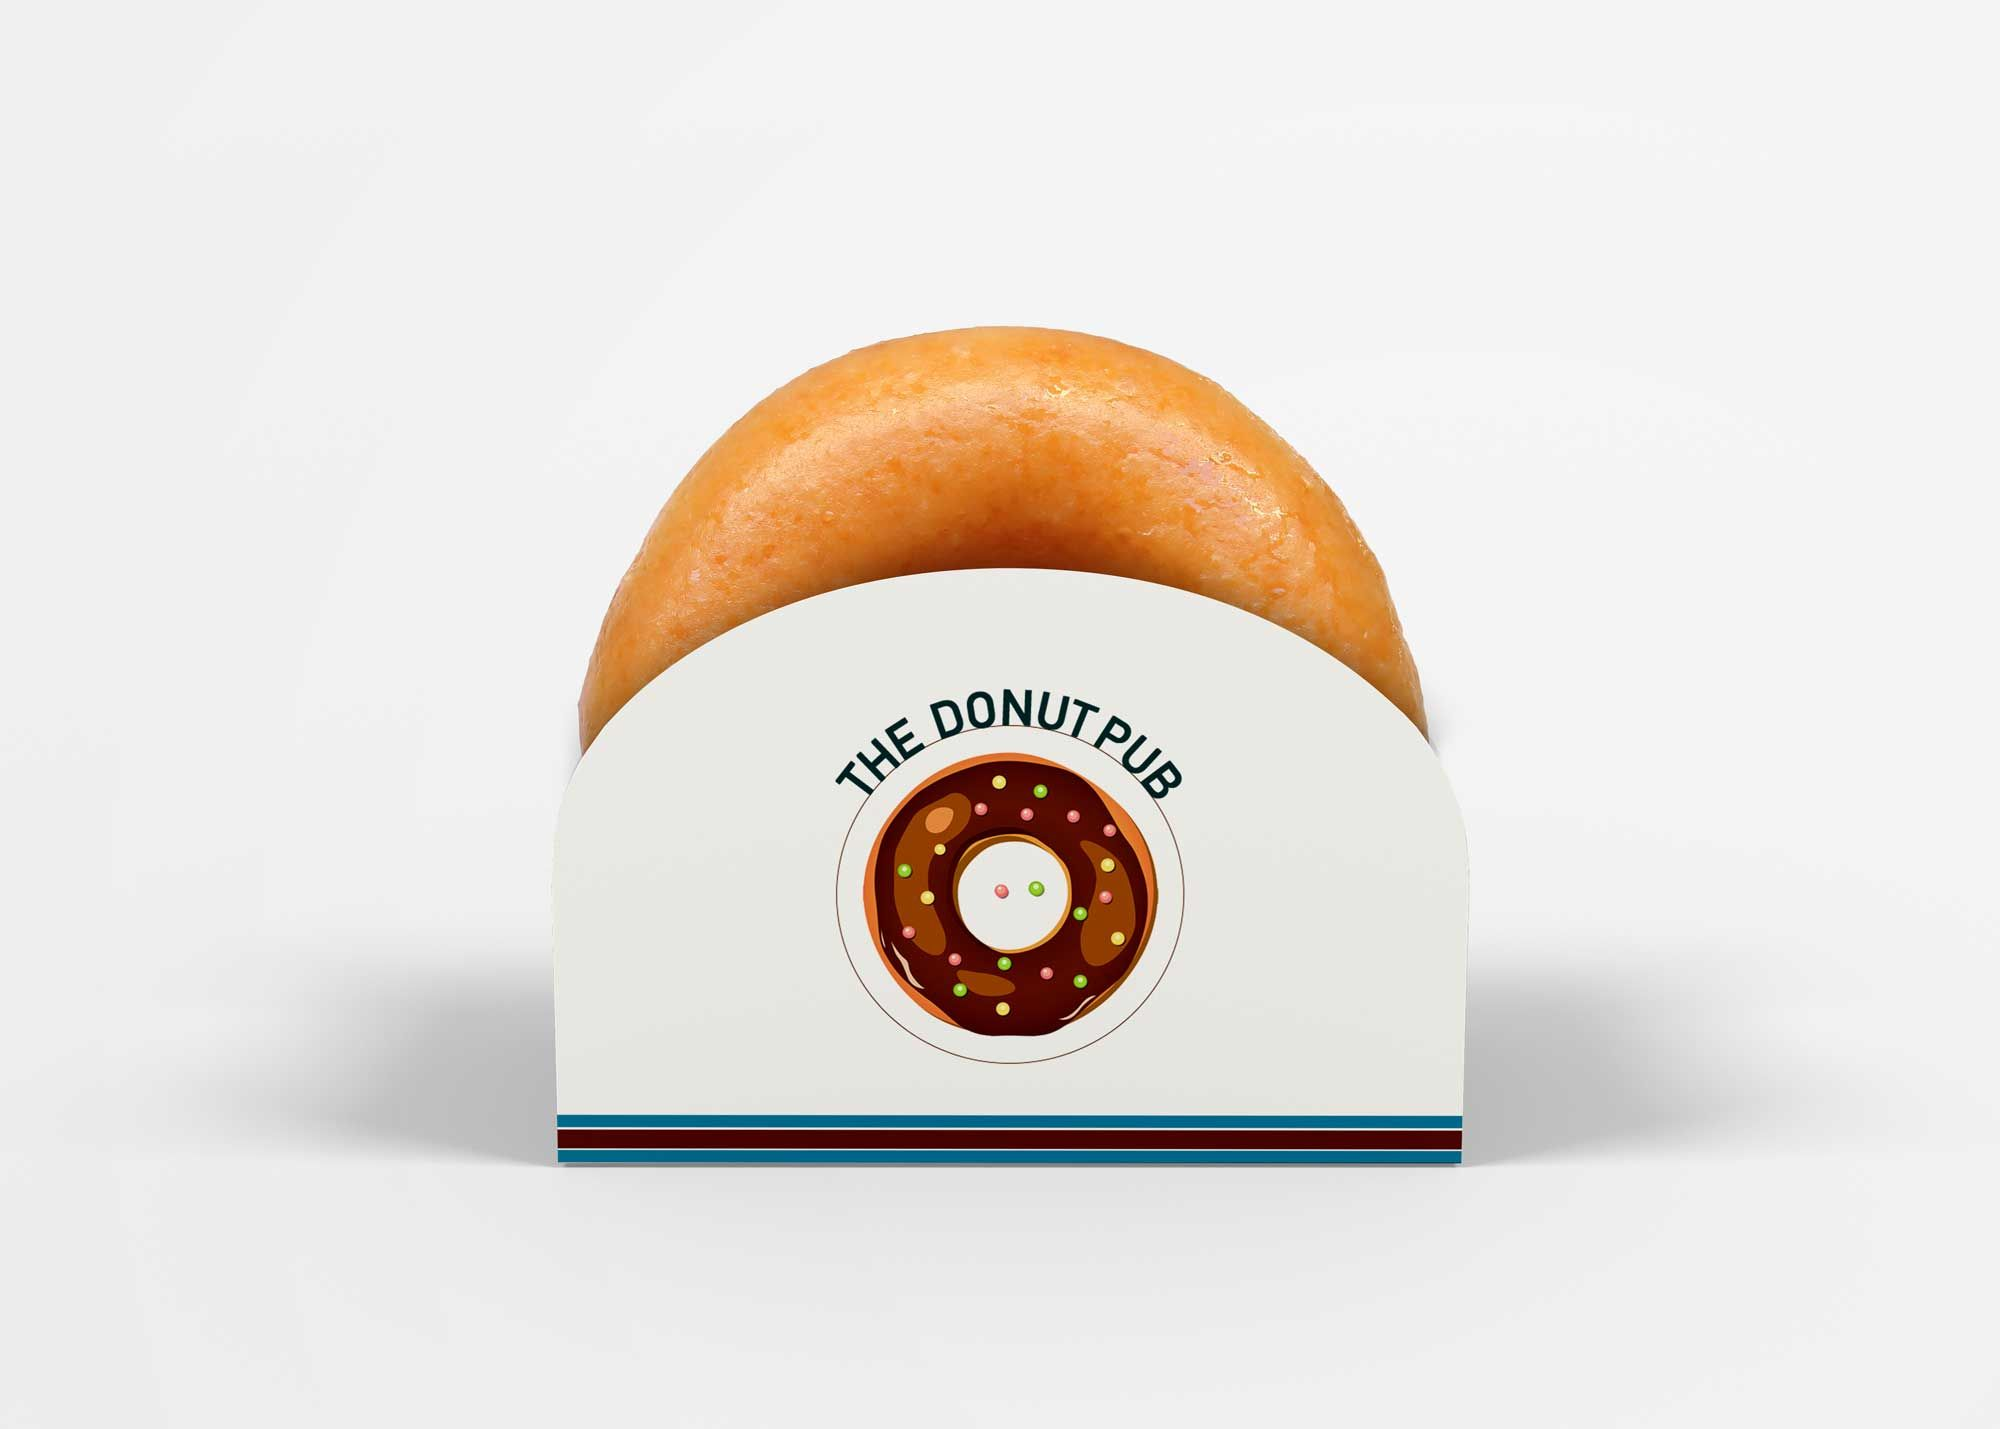 Download Free Single Donut Box Mockup Box Mockup Donut Box Mockup